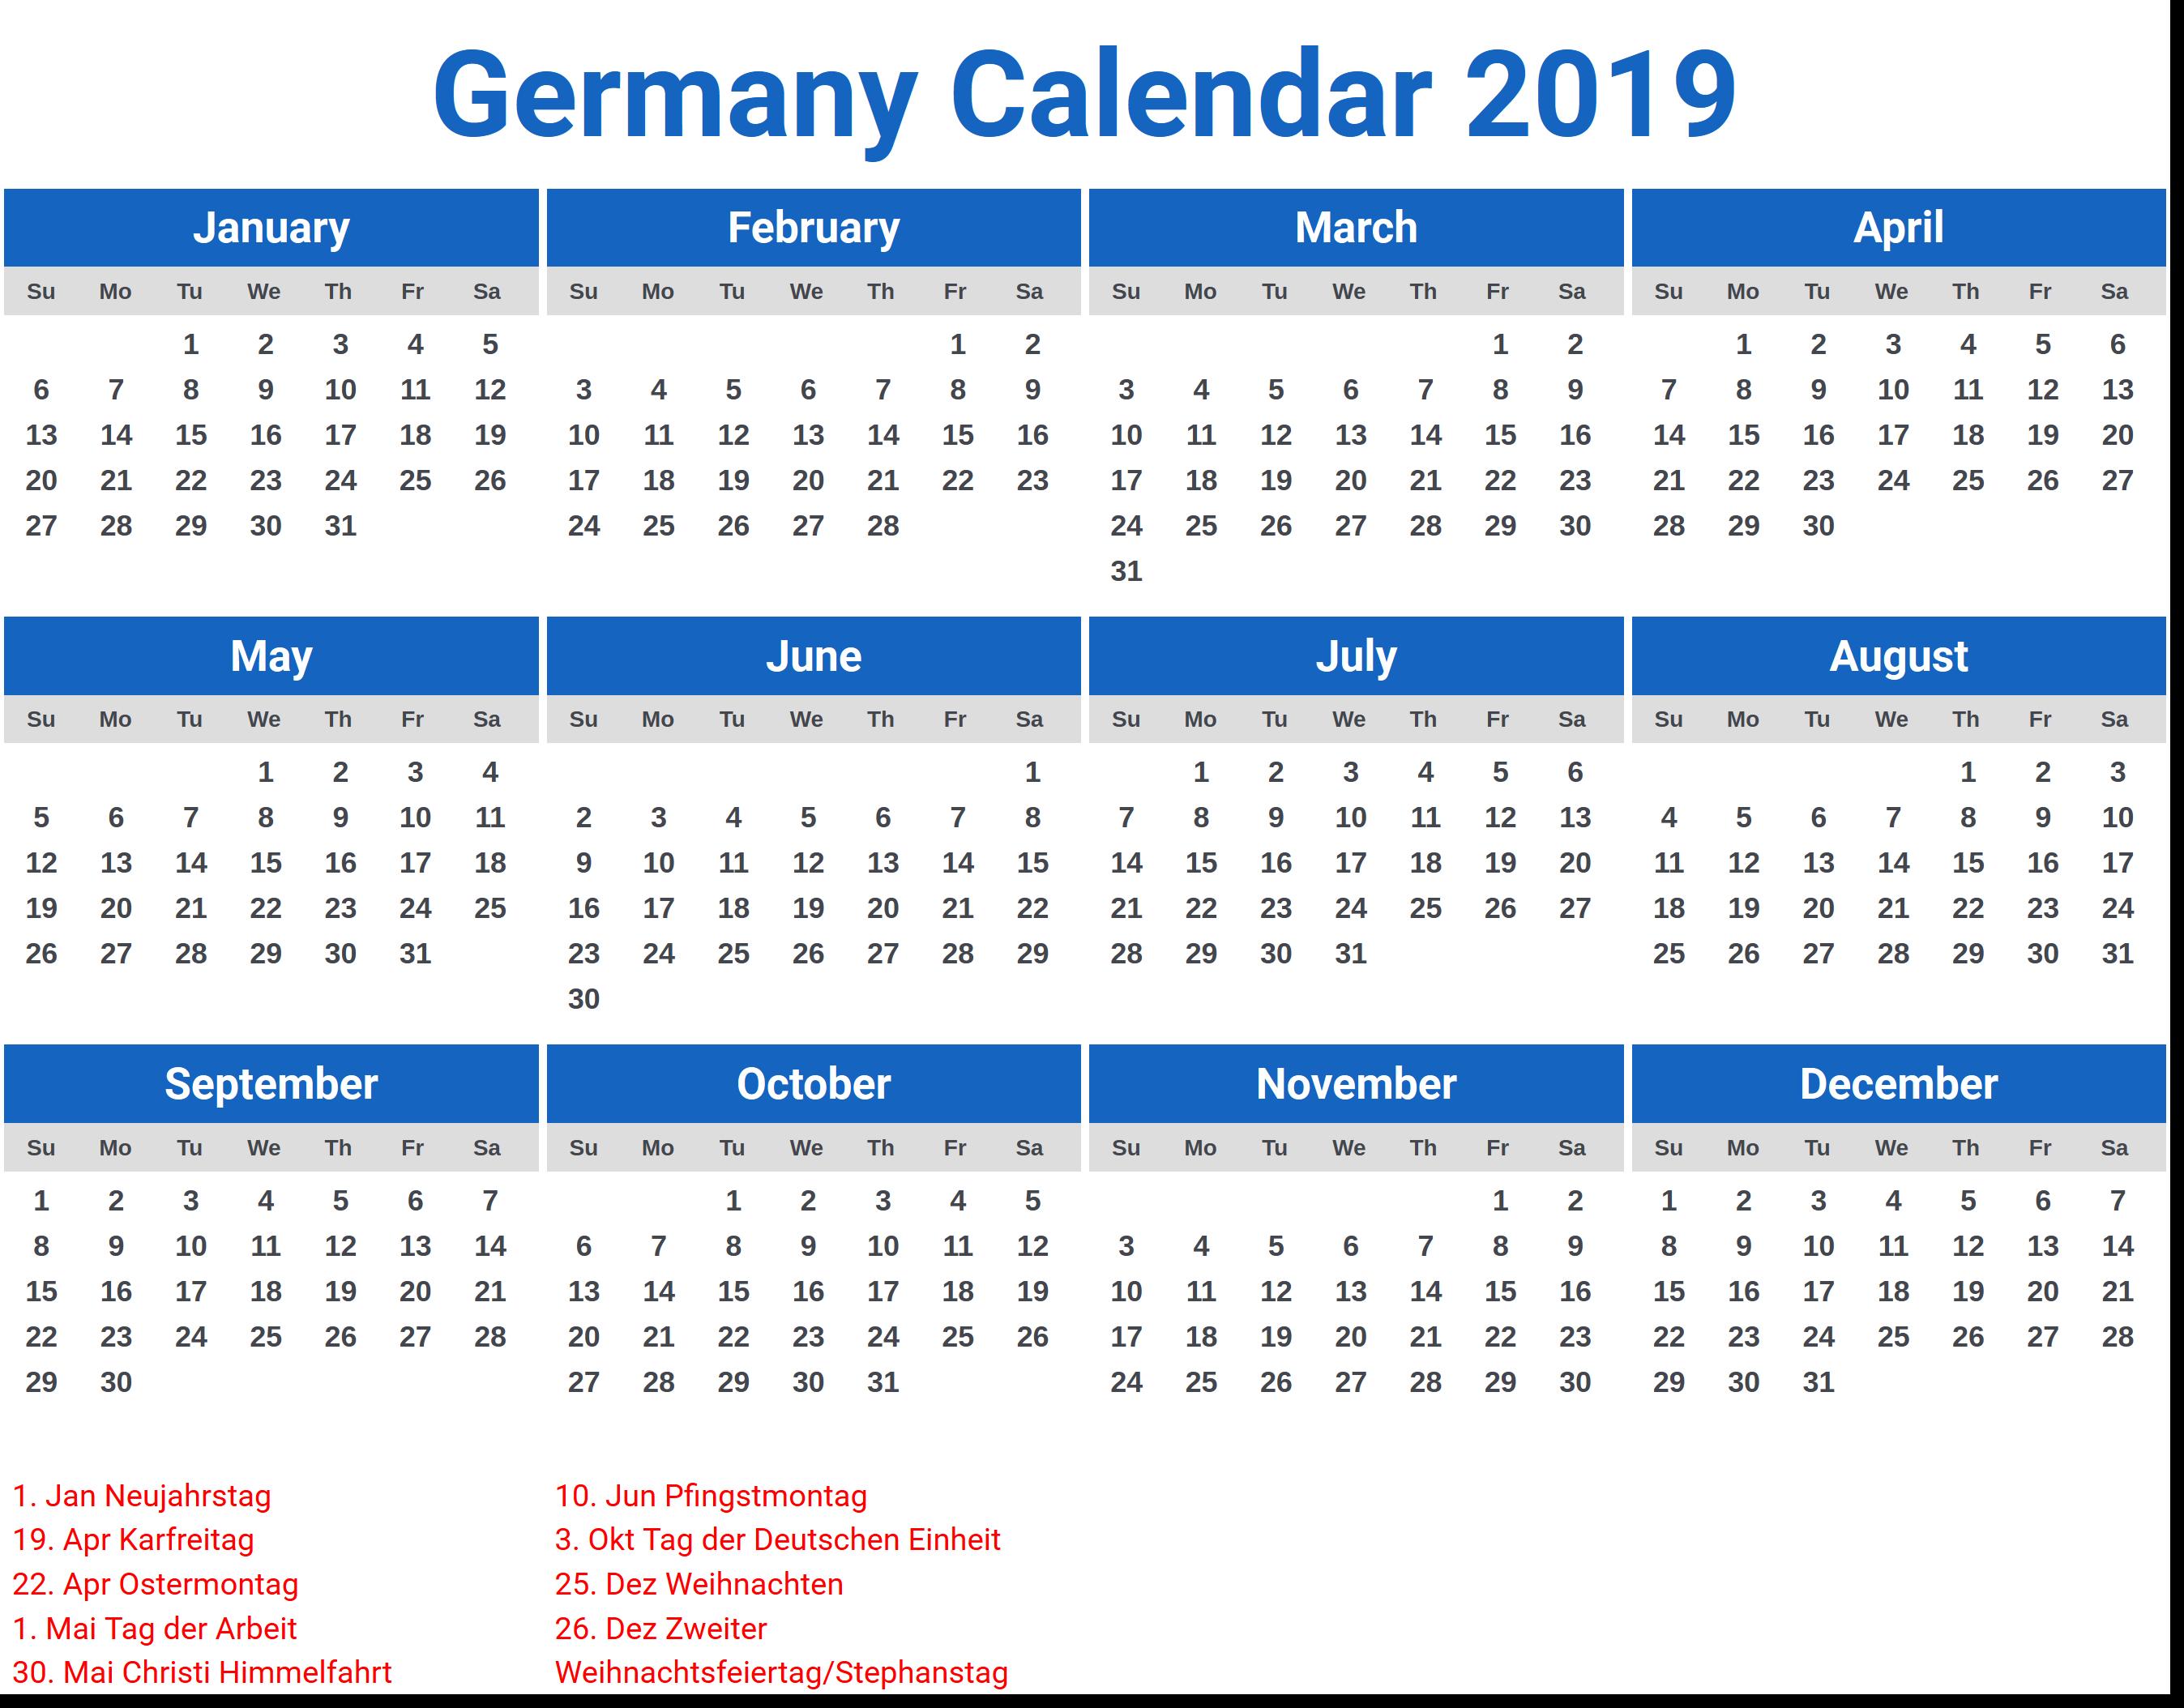 Germany Calendar Printable 2019